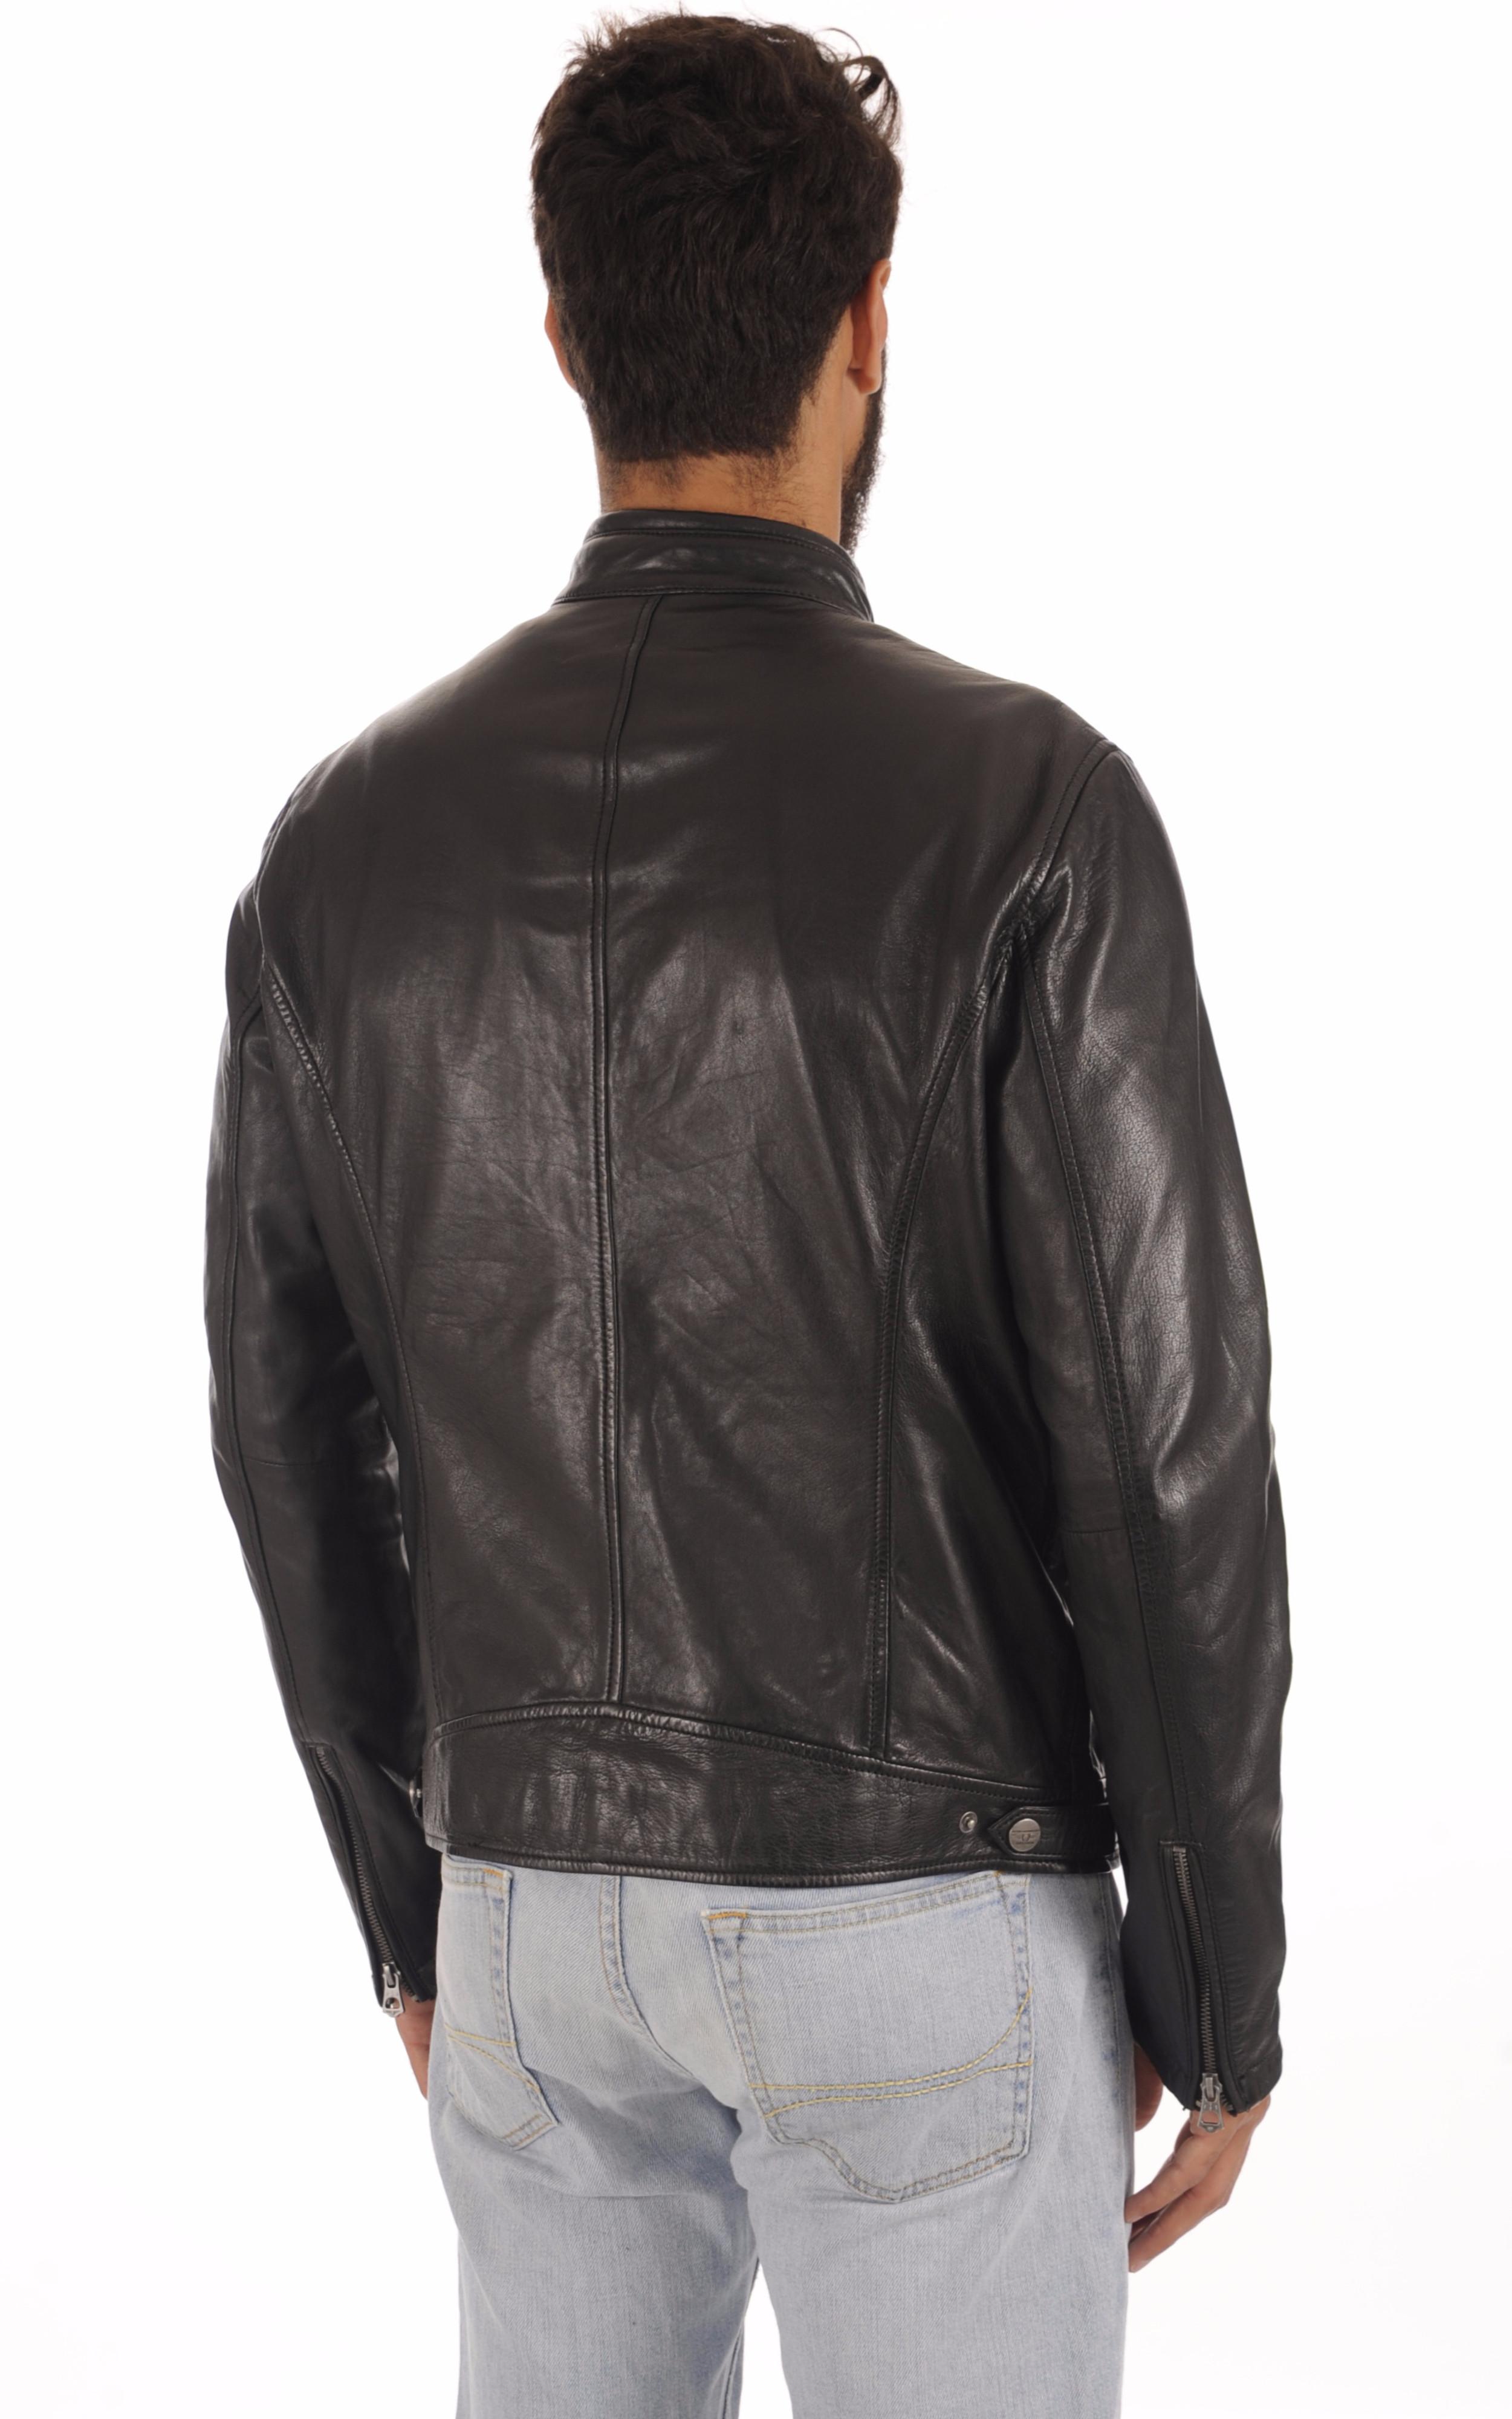 Blouson Confort Cuir Noir Homme Daytona 73